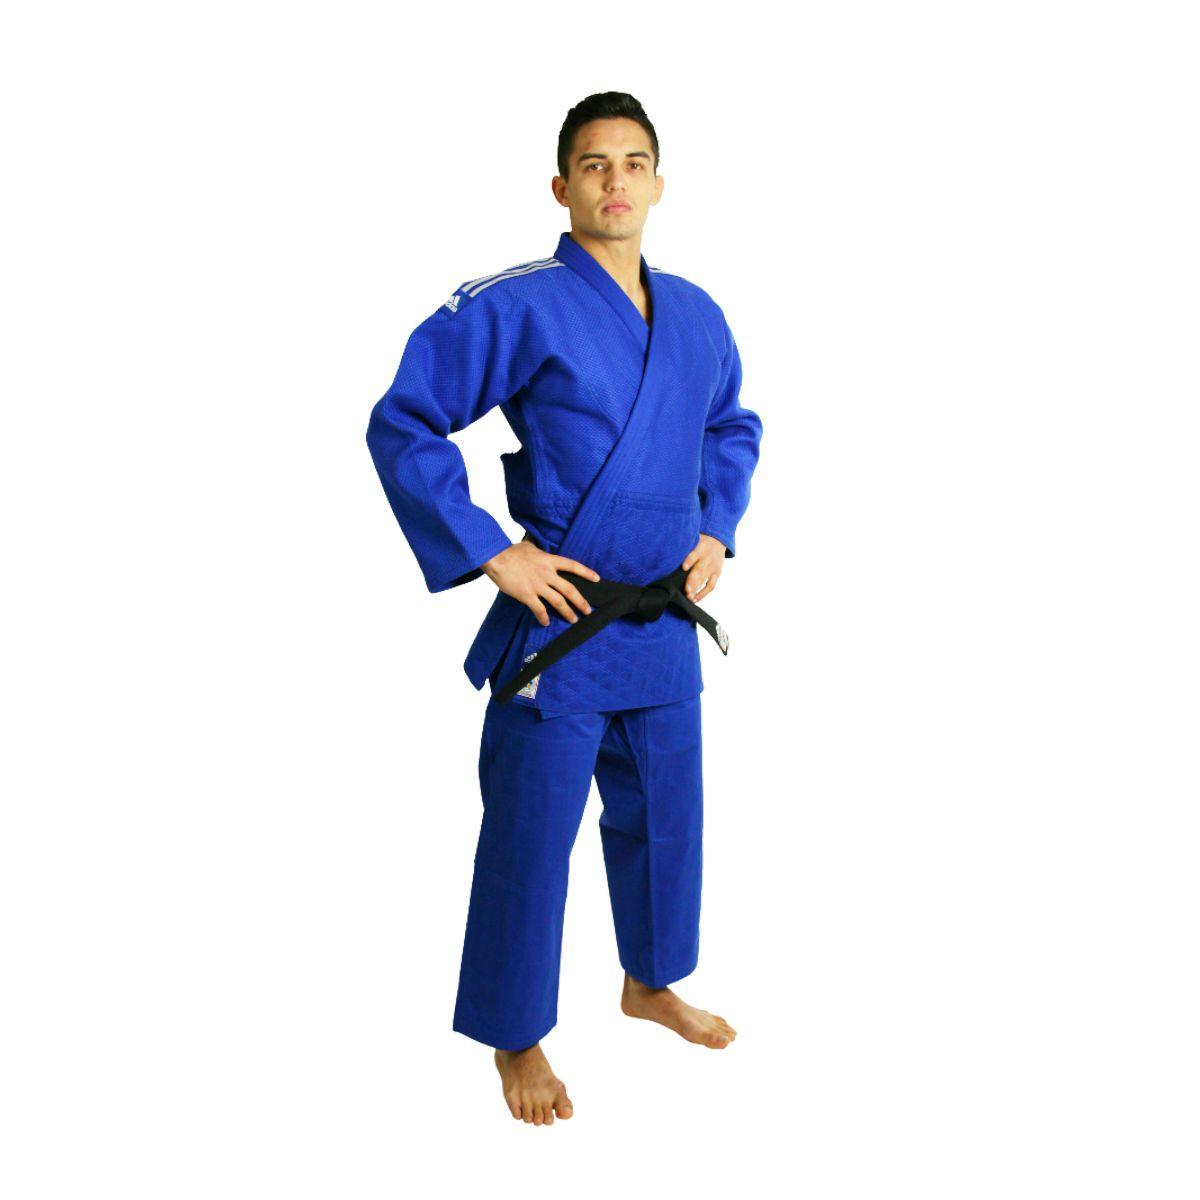 Kimono Judô adidas Champion II Azul - Selo eletrônico IJF